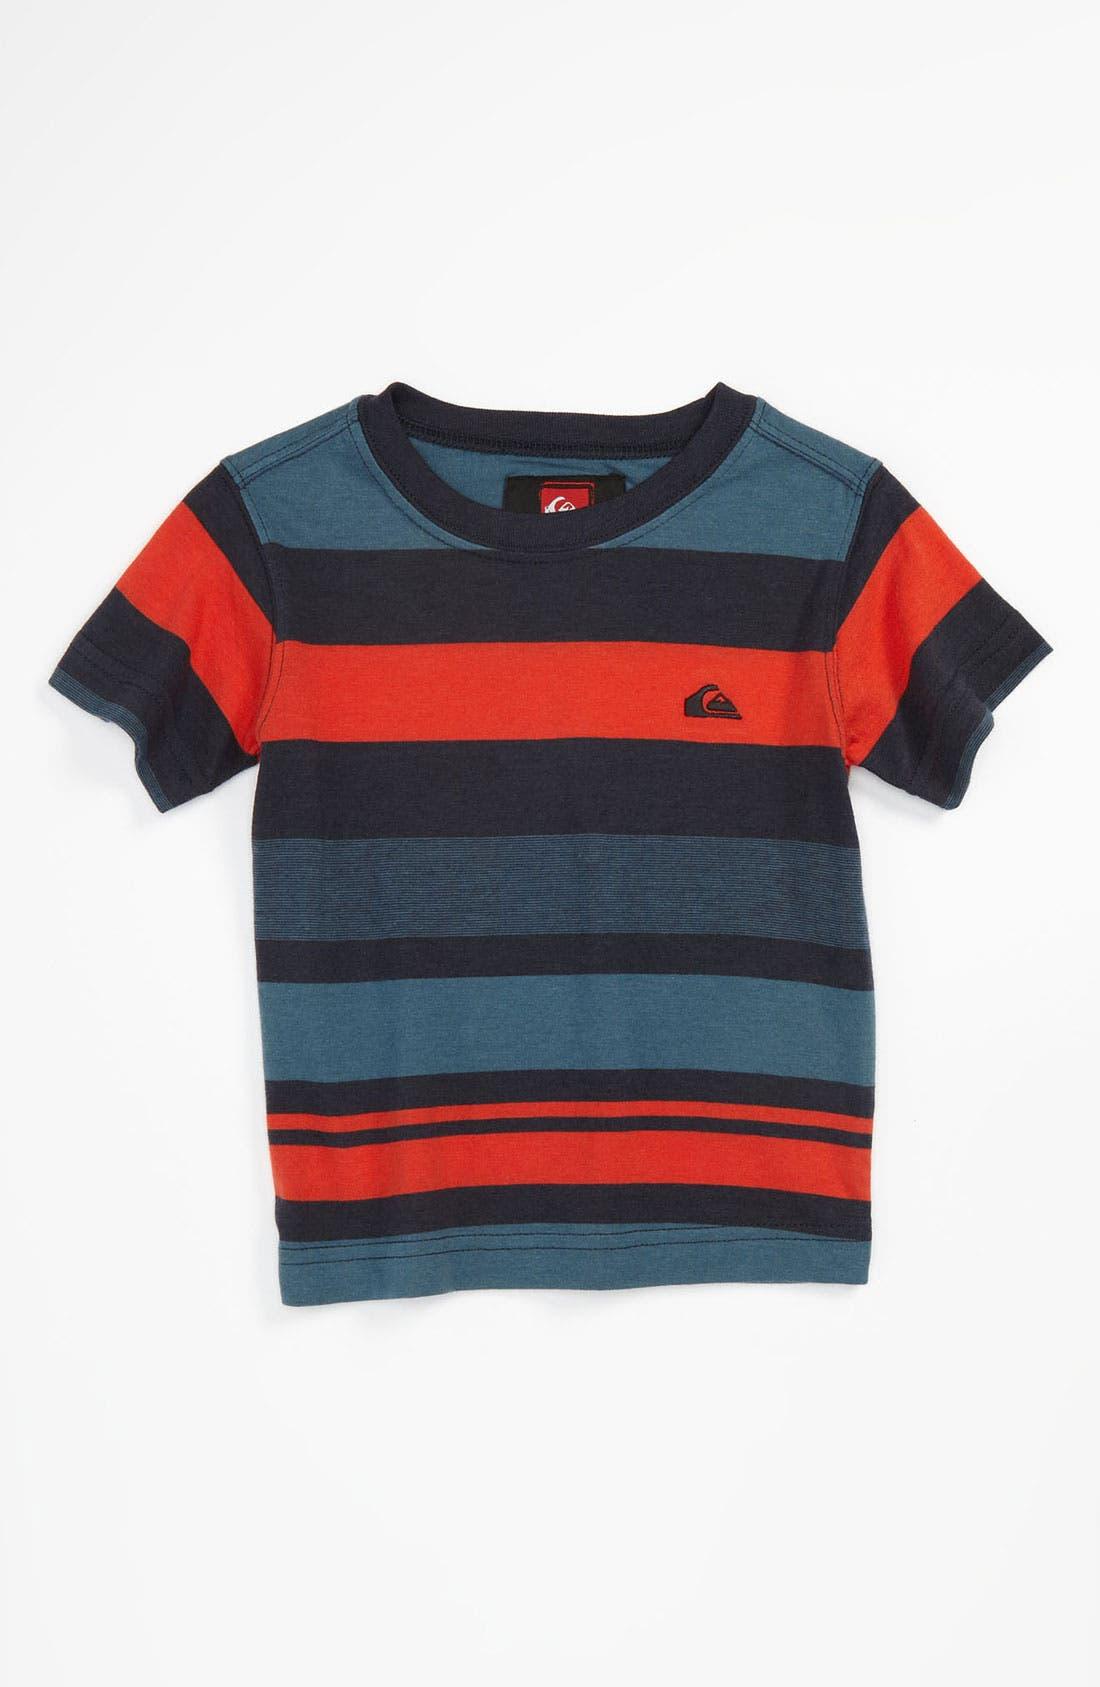 Alternate Image 1 Selected - Quiksilver 'Reasoner' T-Shirt (Infant)